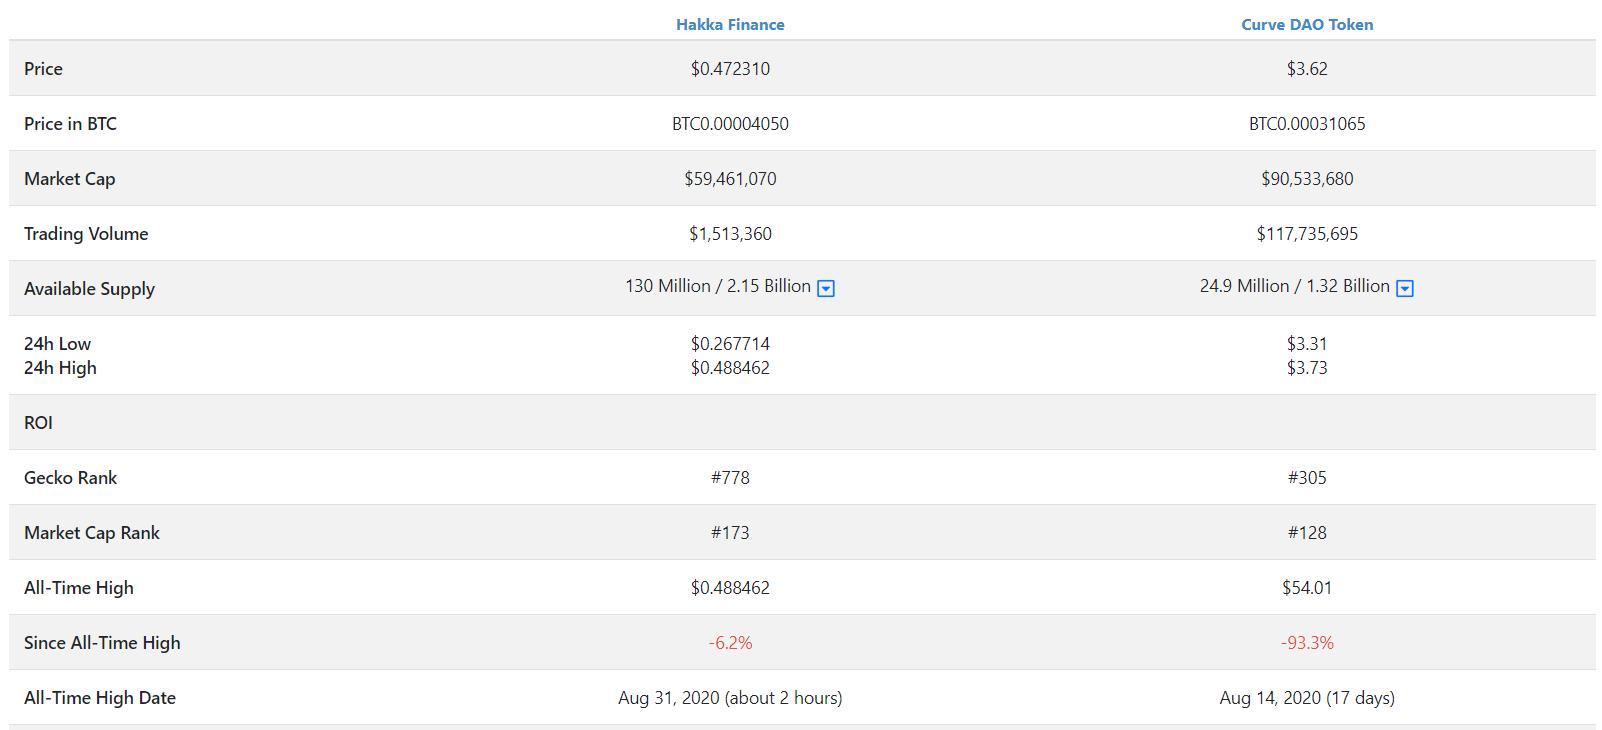 Hakka Finance (HAKKA) với Curve DAO Token (CRV)  - Lần 2 ngày 31/08